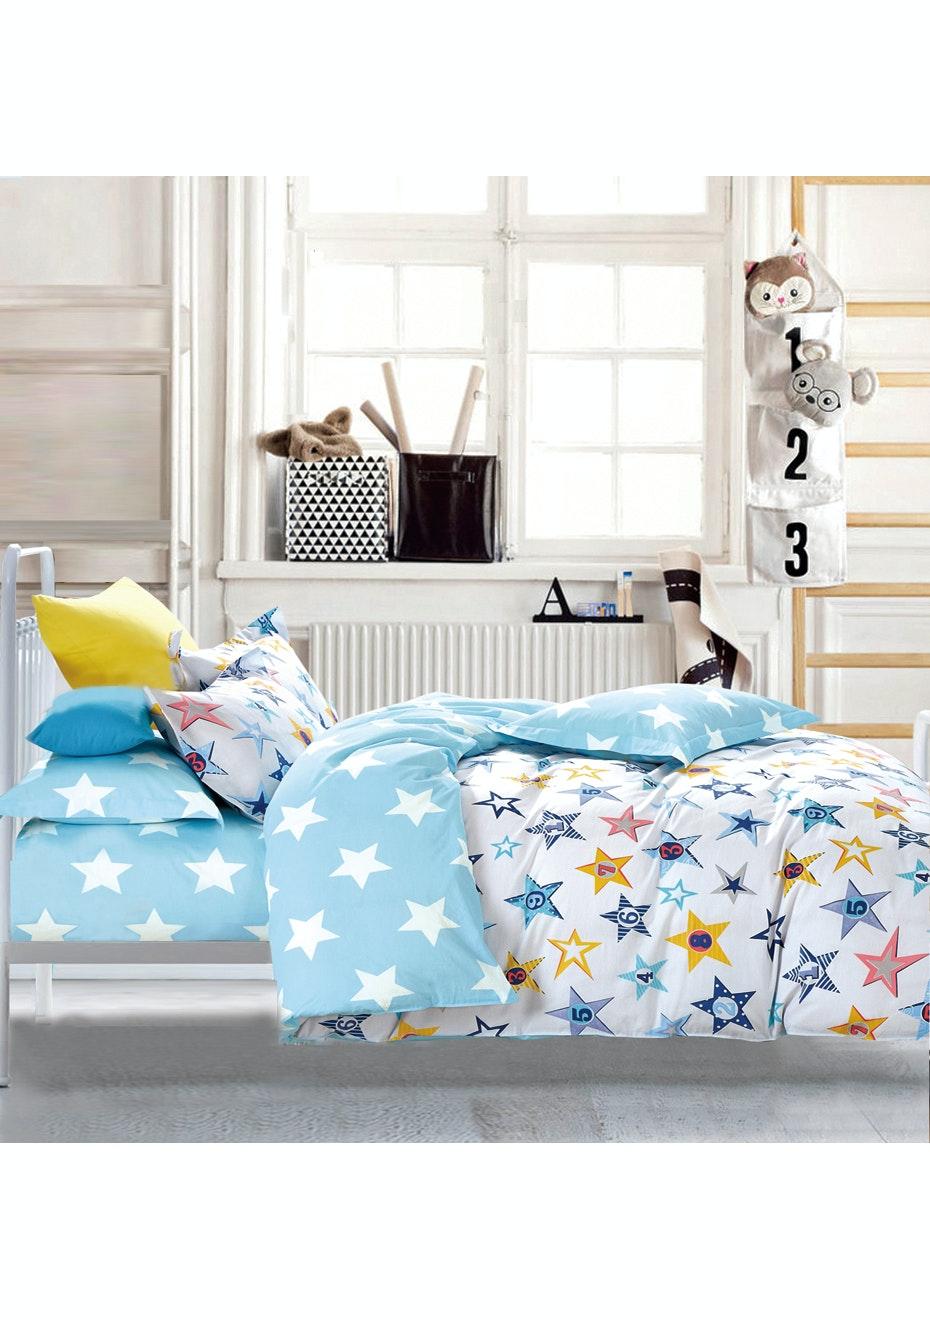 Starbright Quilt Cover Set - Reversible Design - 100% Cotton Single Bed